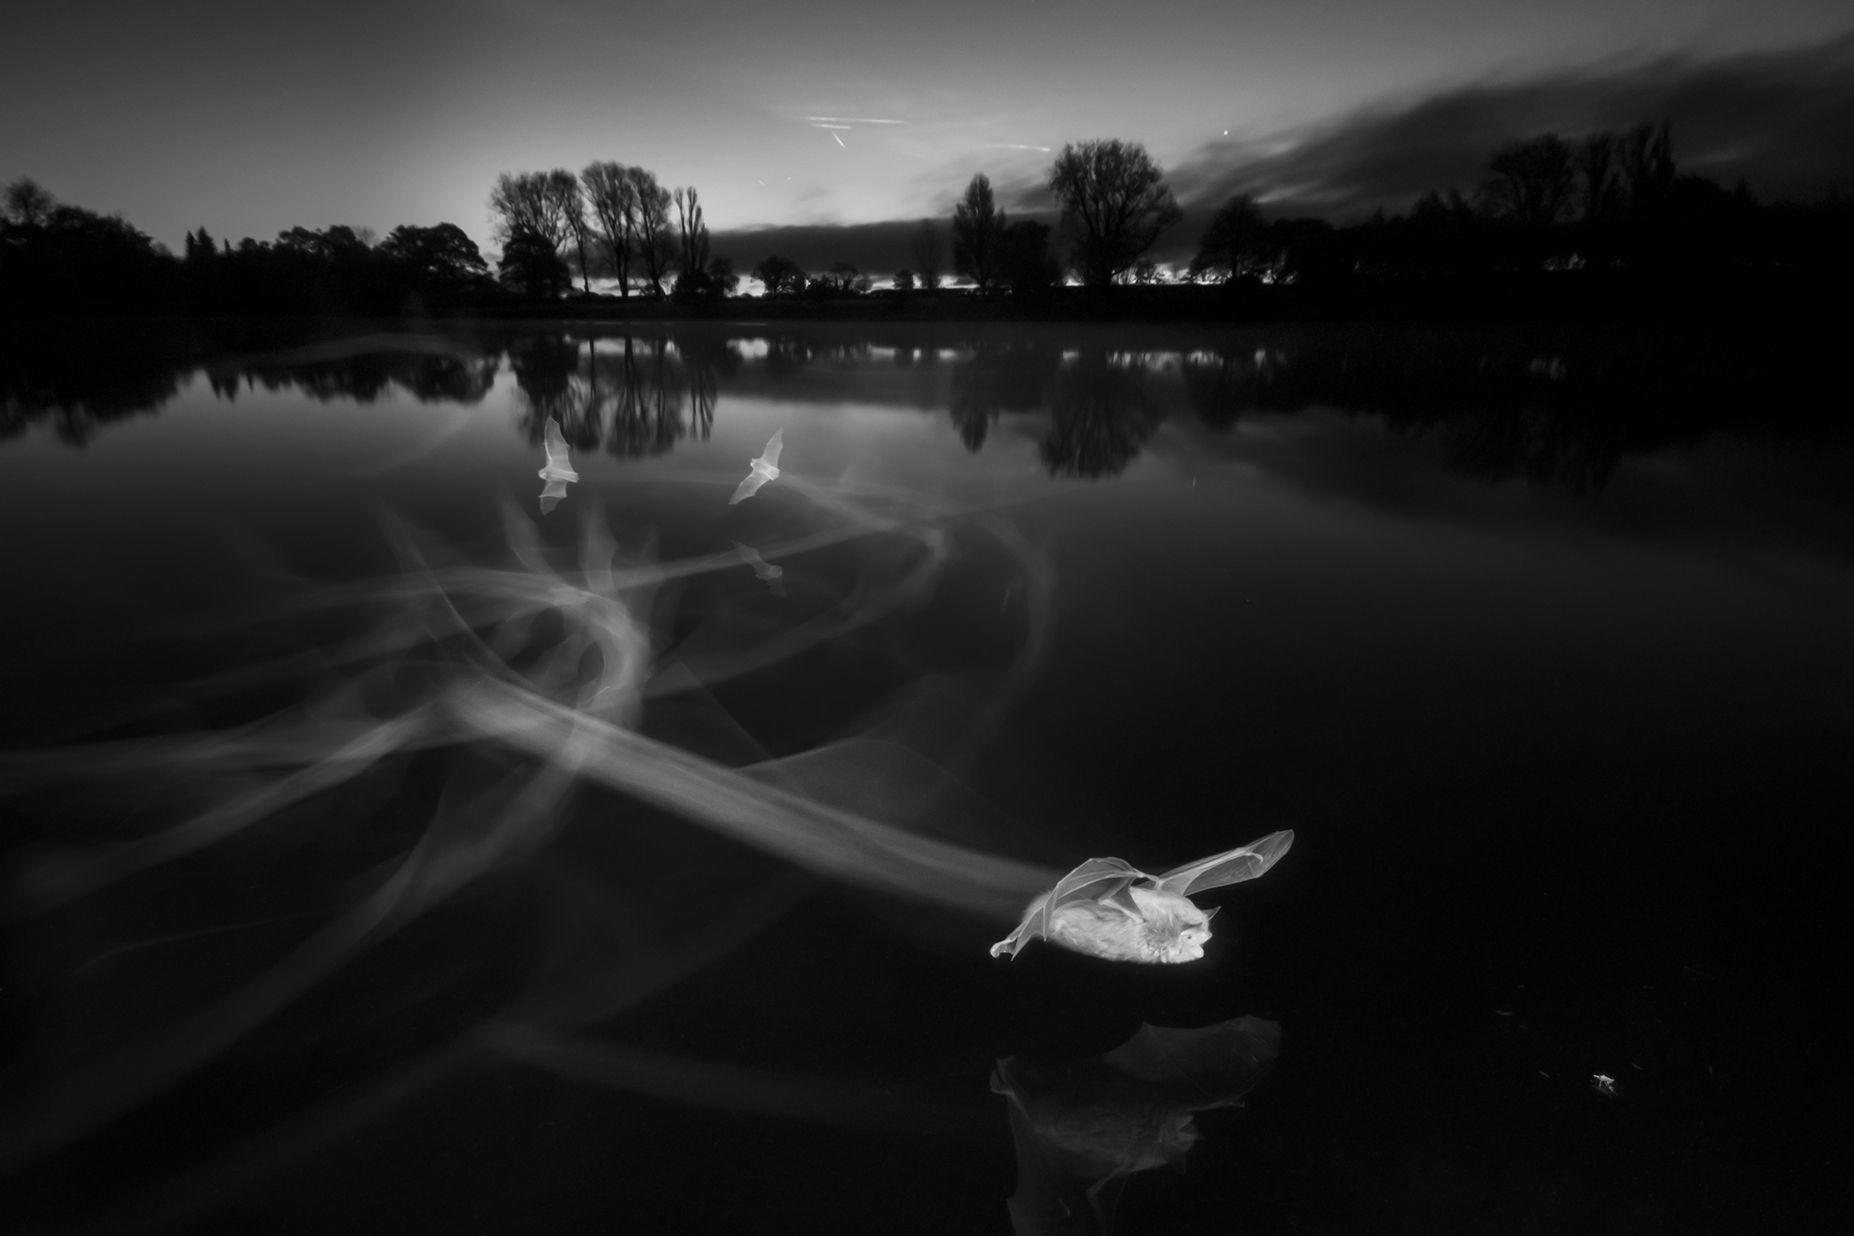 British wildlife photography awards - bats at night